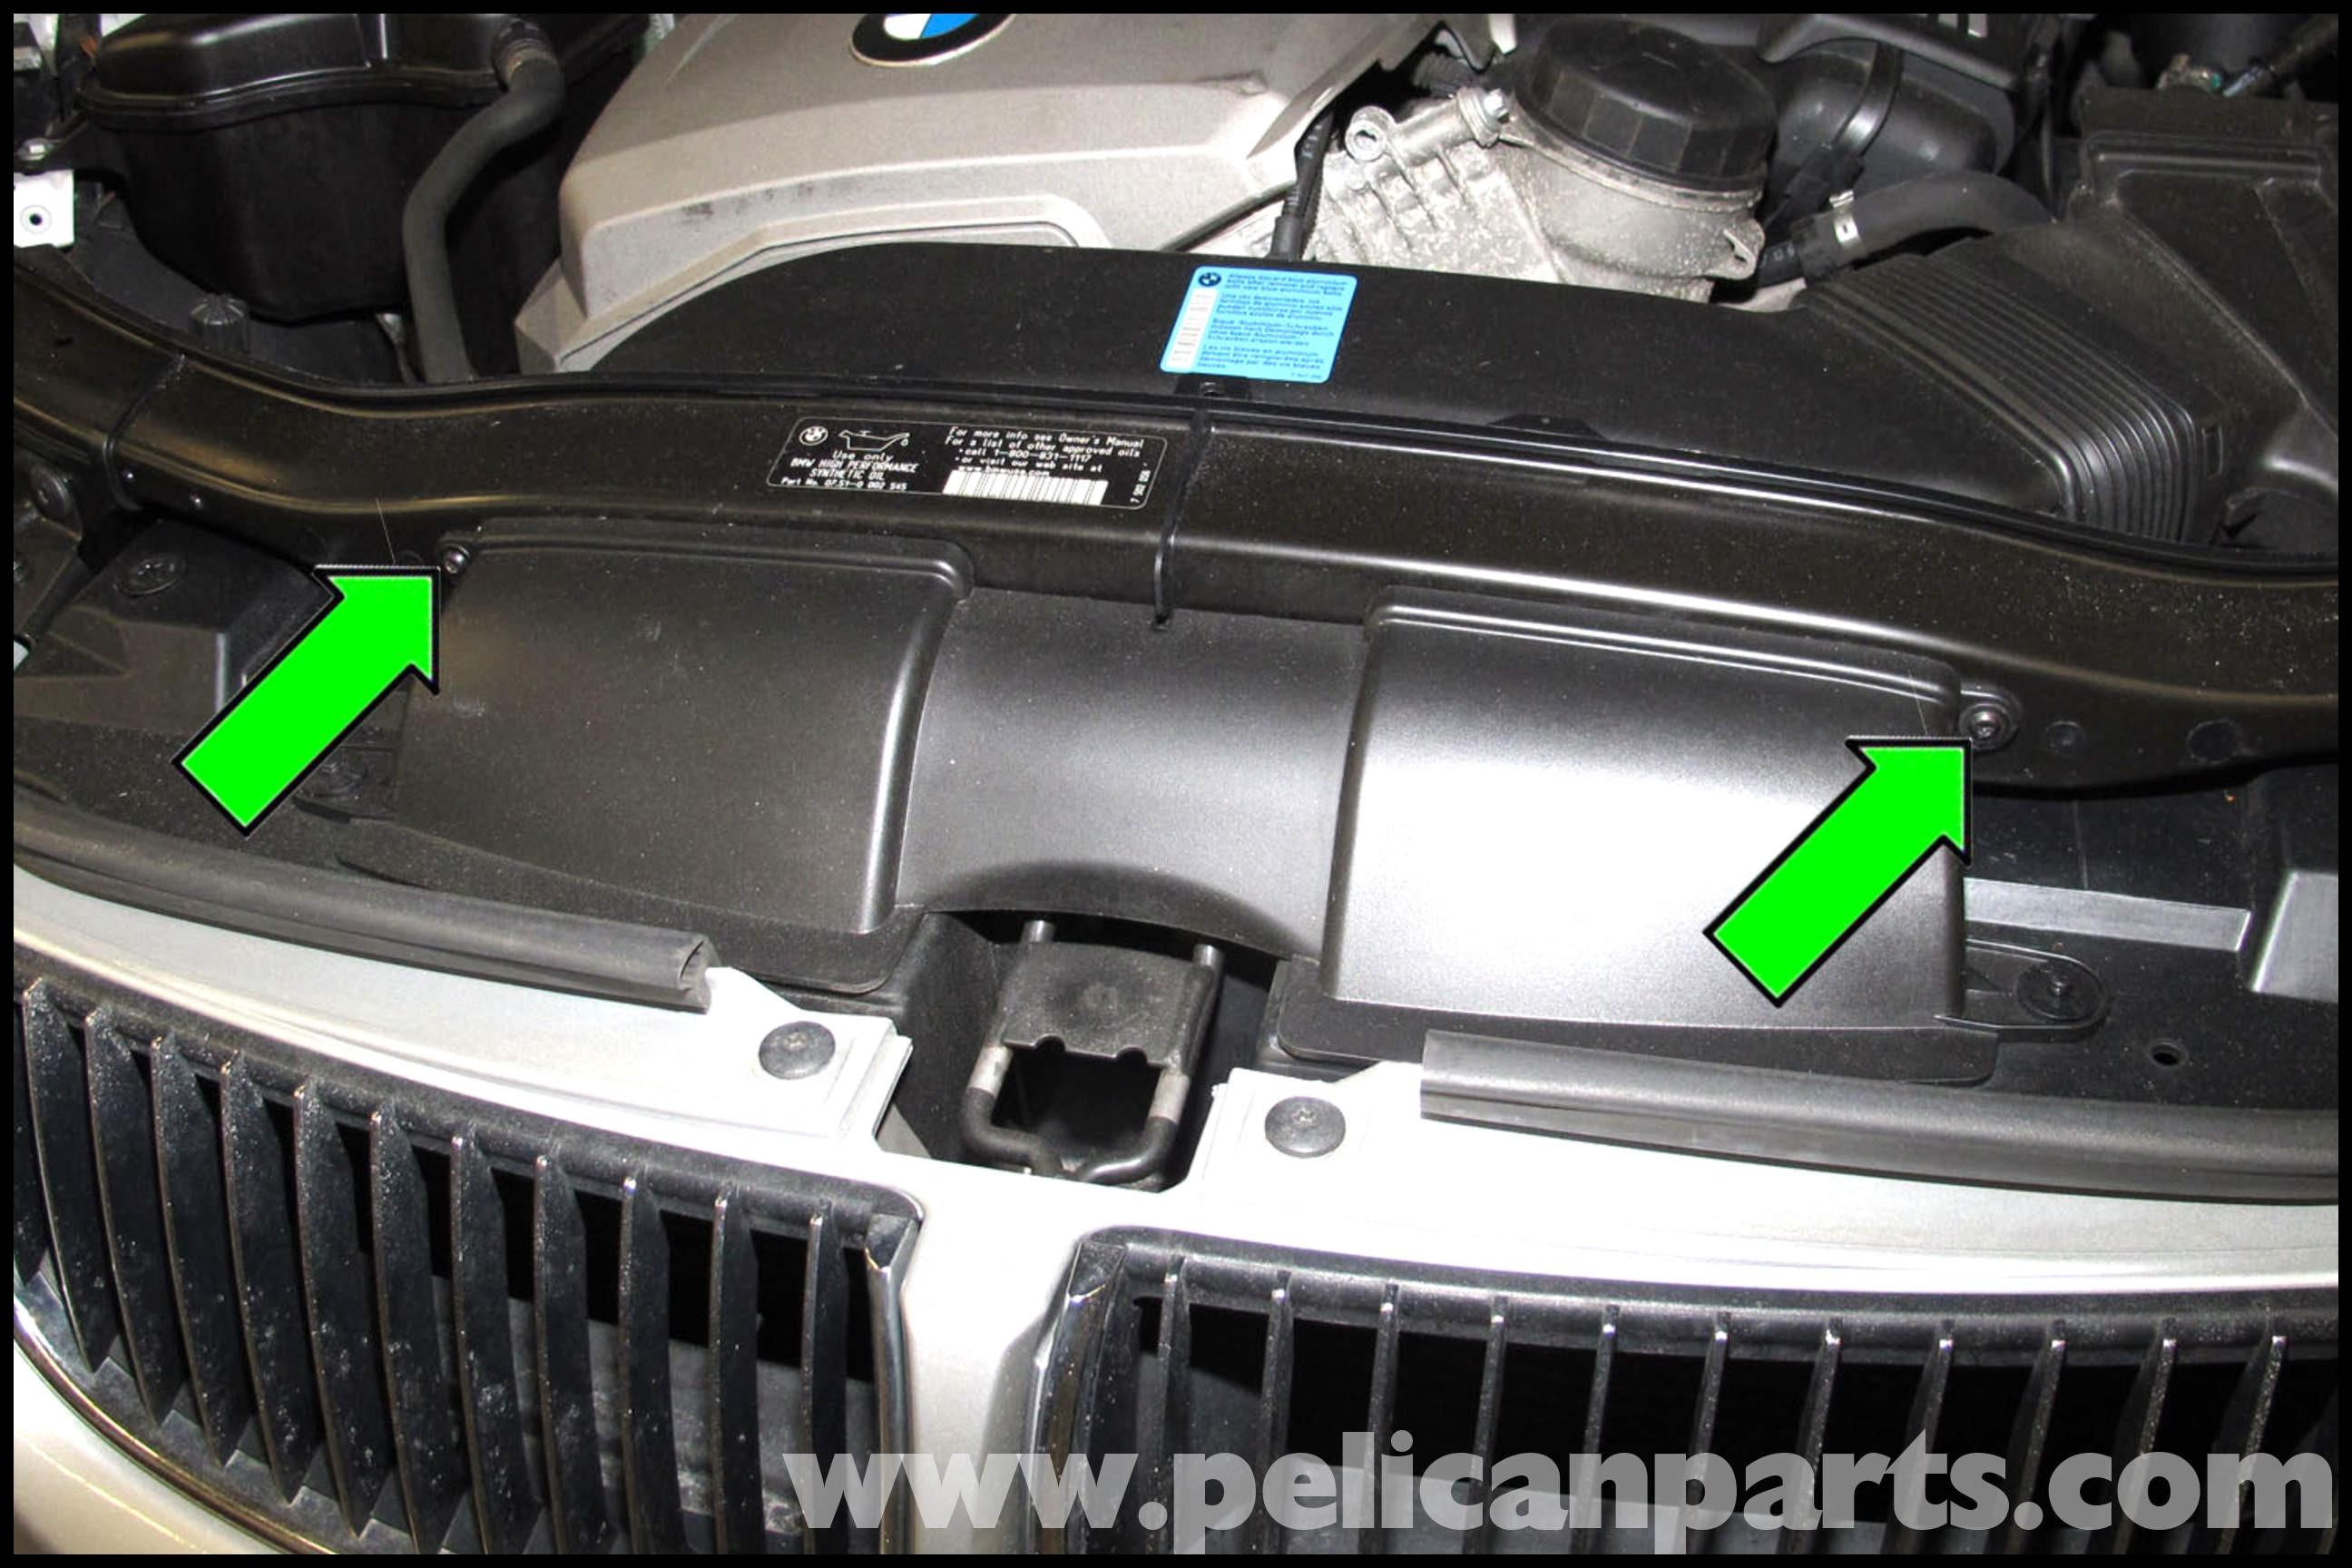 2011 Bmw X5 Starter Replacement Beautiful Bmw E90 Alternator Replacement E91 E92 E93 2011 Bmw